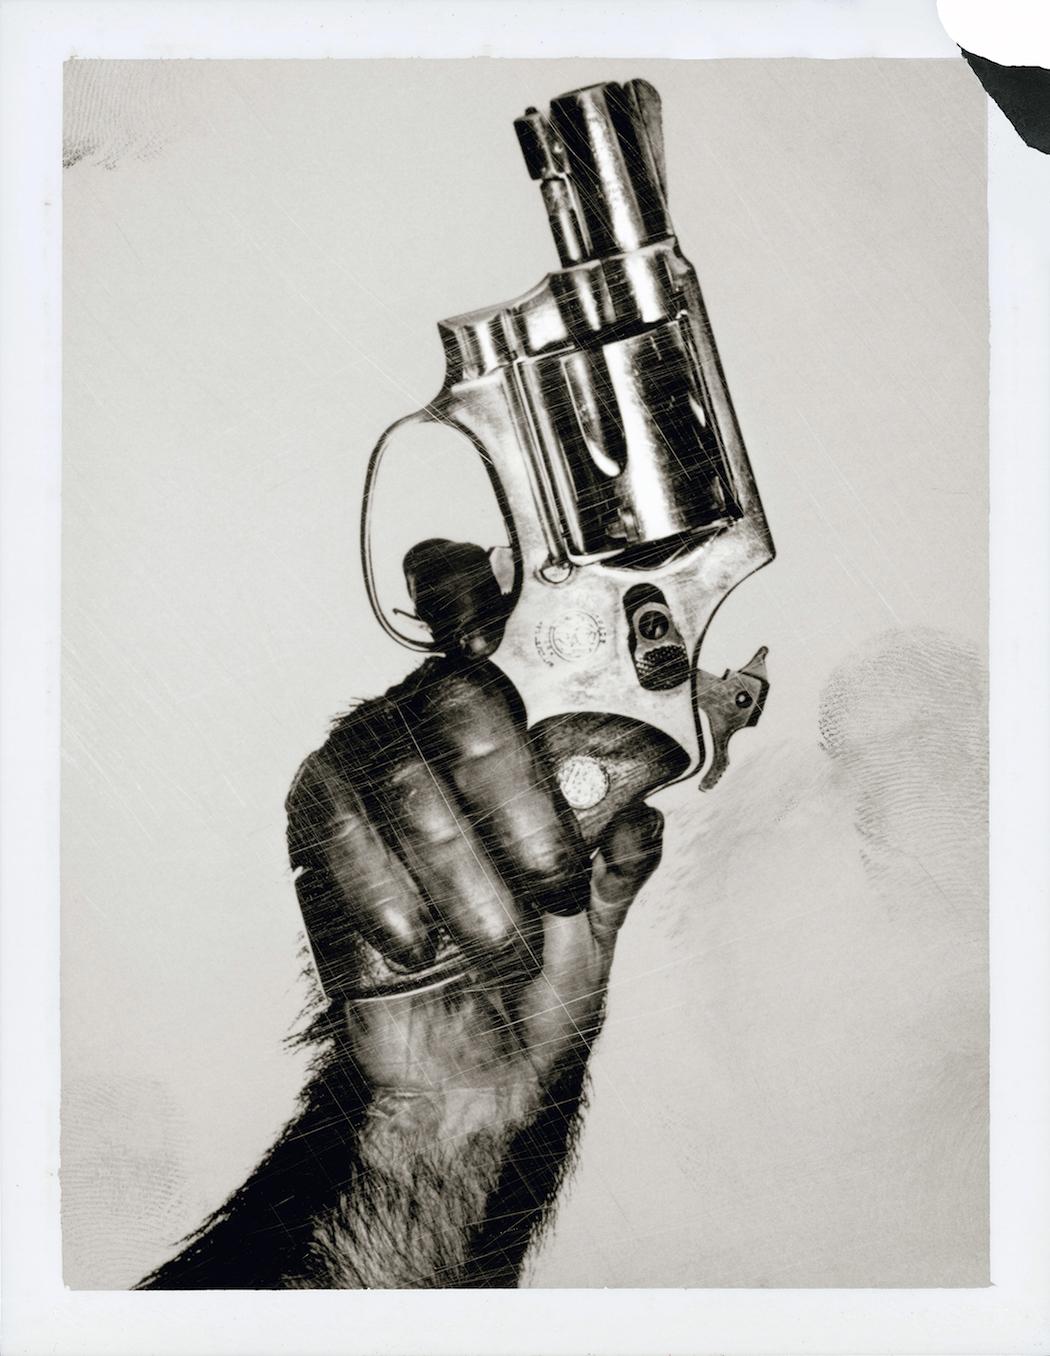 WATSON_Monkey-with-Gun_New-York-City_1992_polaroid-1